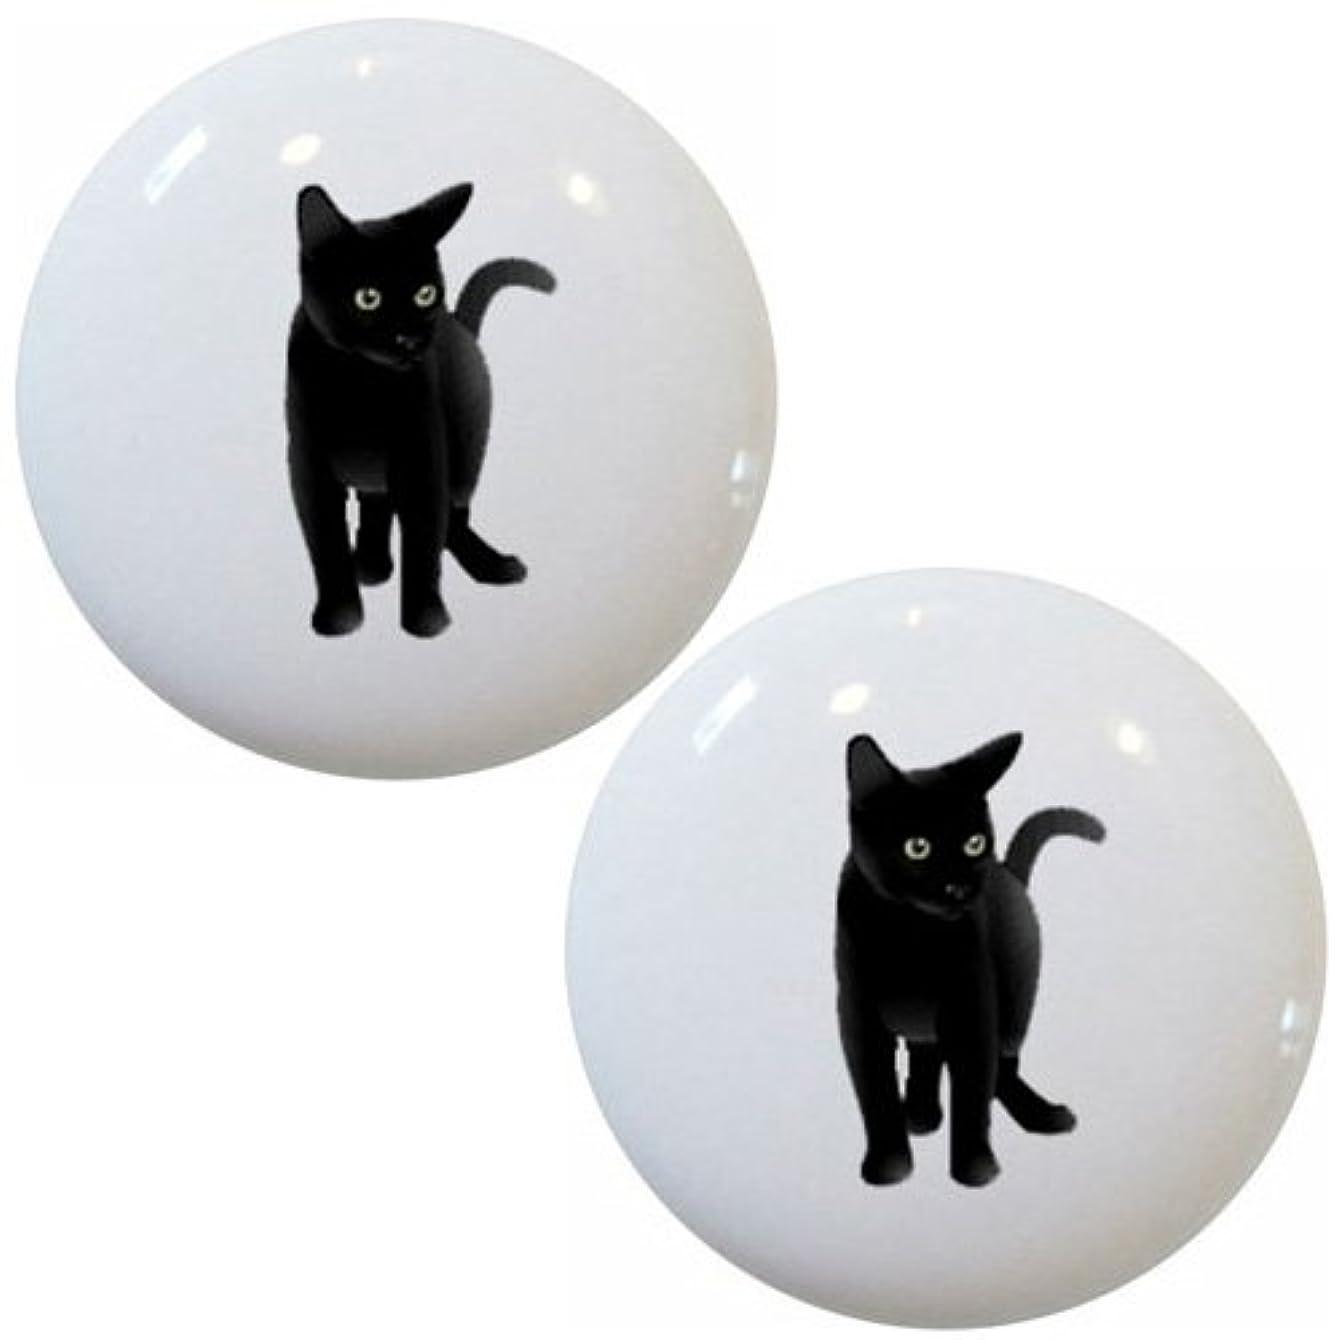 Set of 2 Black Cat Ceramic Cabinet Drawer Pull Knobs